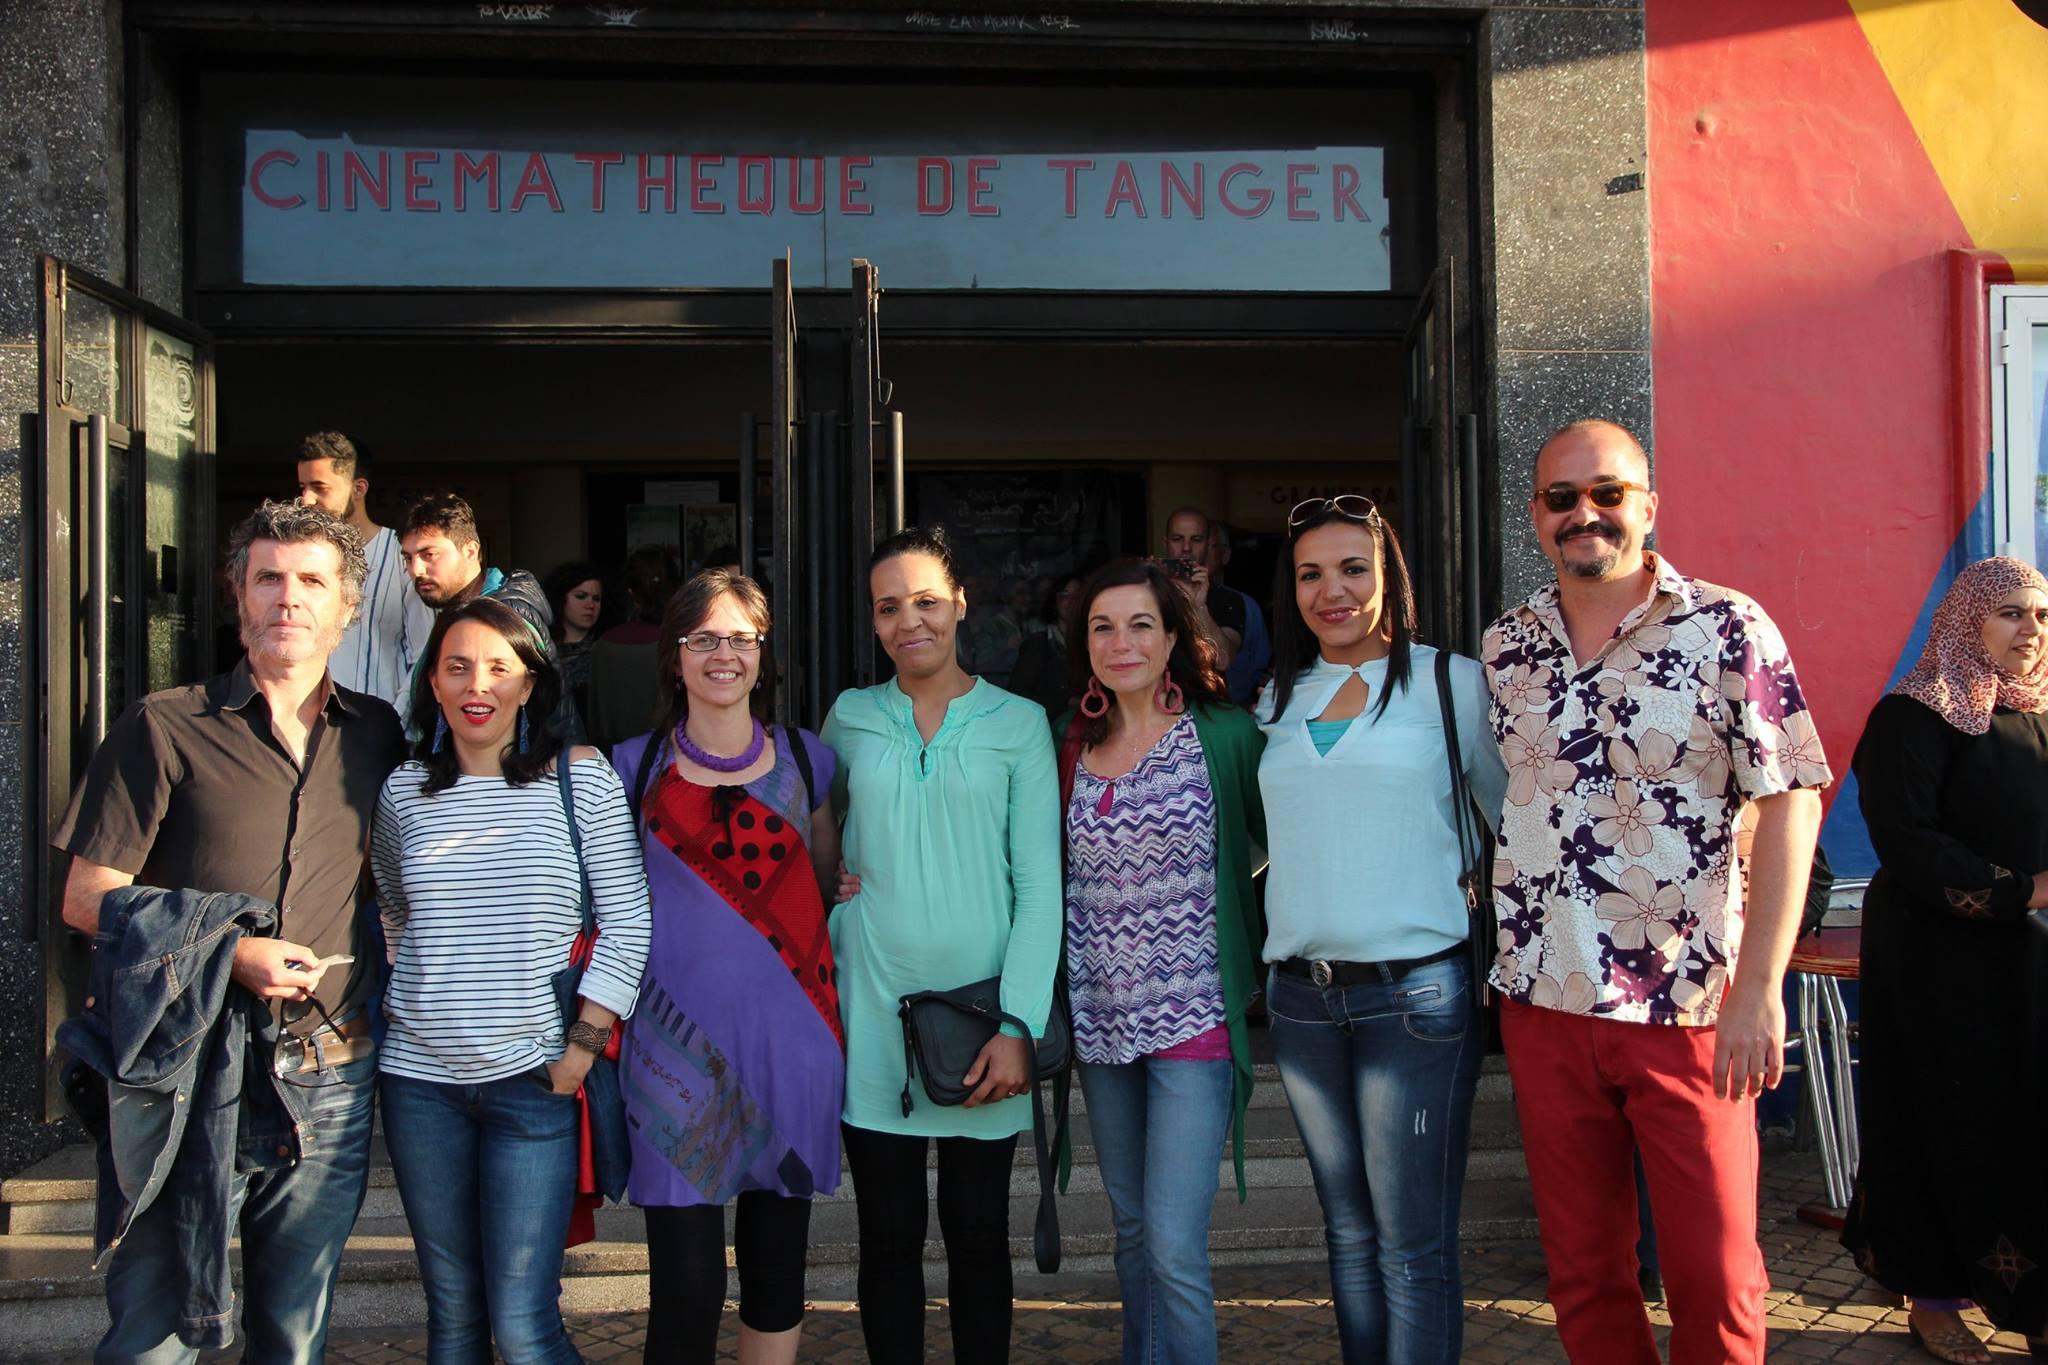 Cinematheque de Tanger. Madres Invisibles